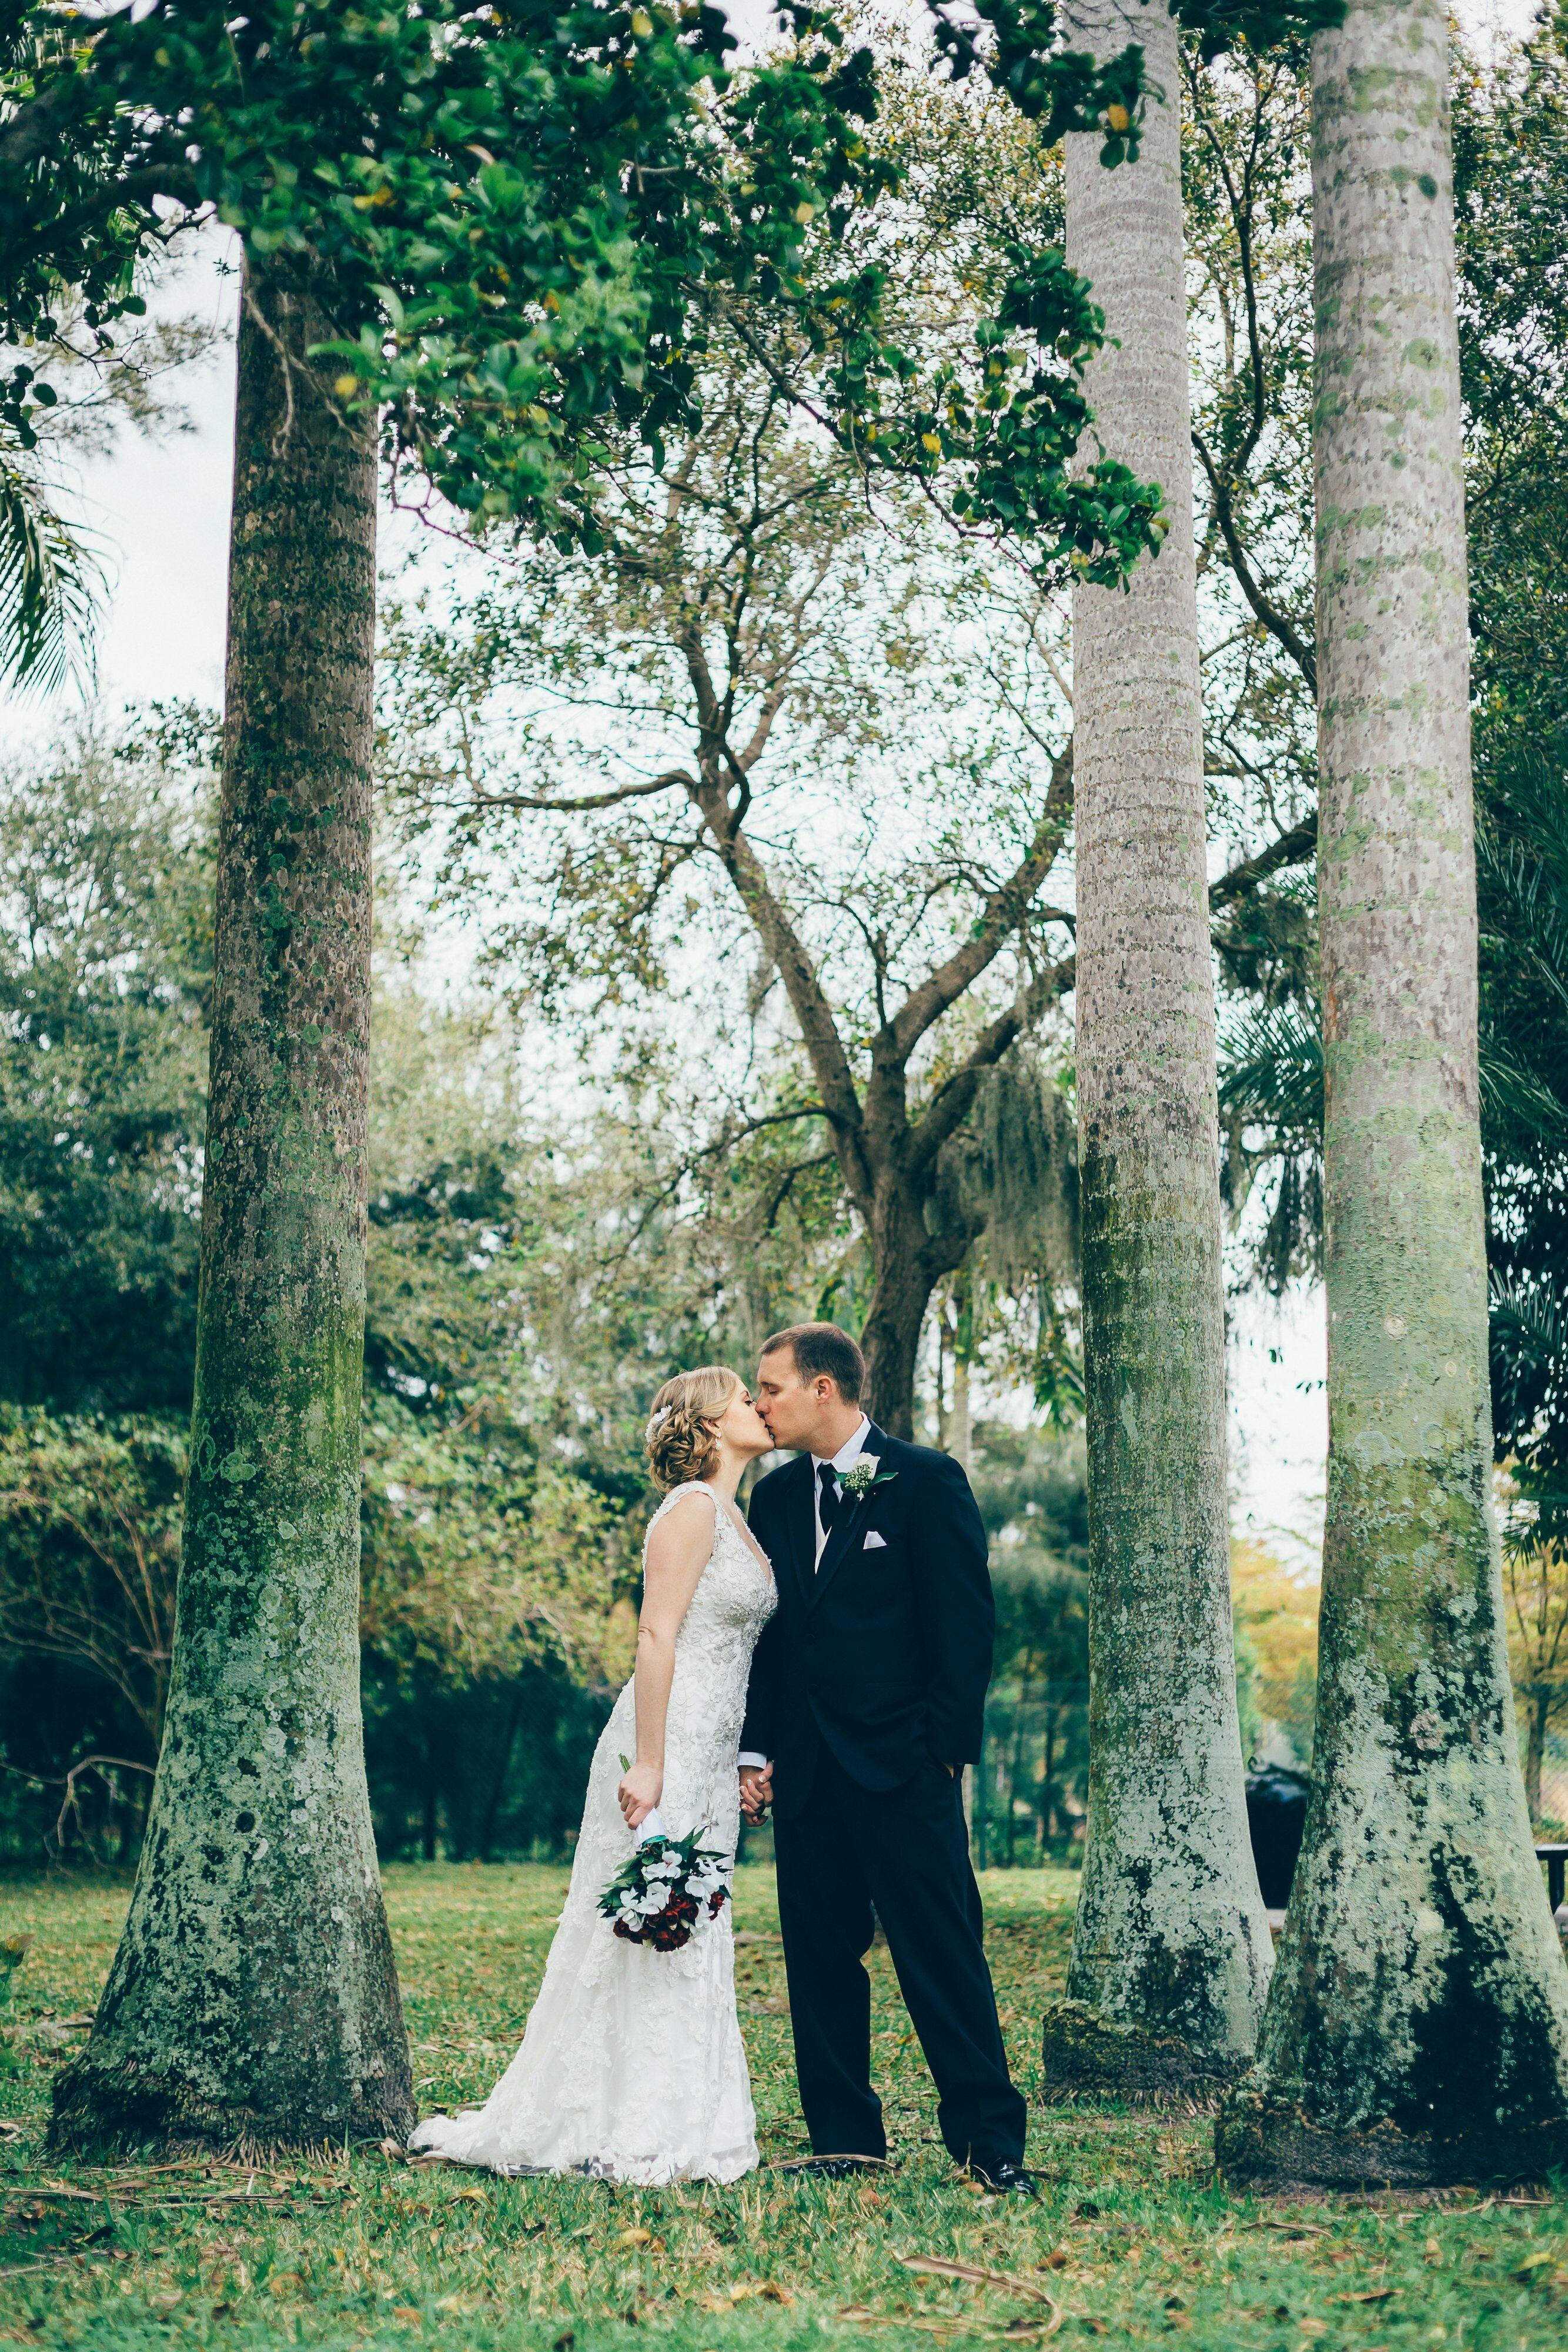 A Simple Garden Wedding At Palma Sola Botanical Park In